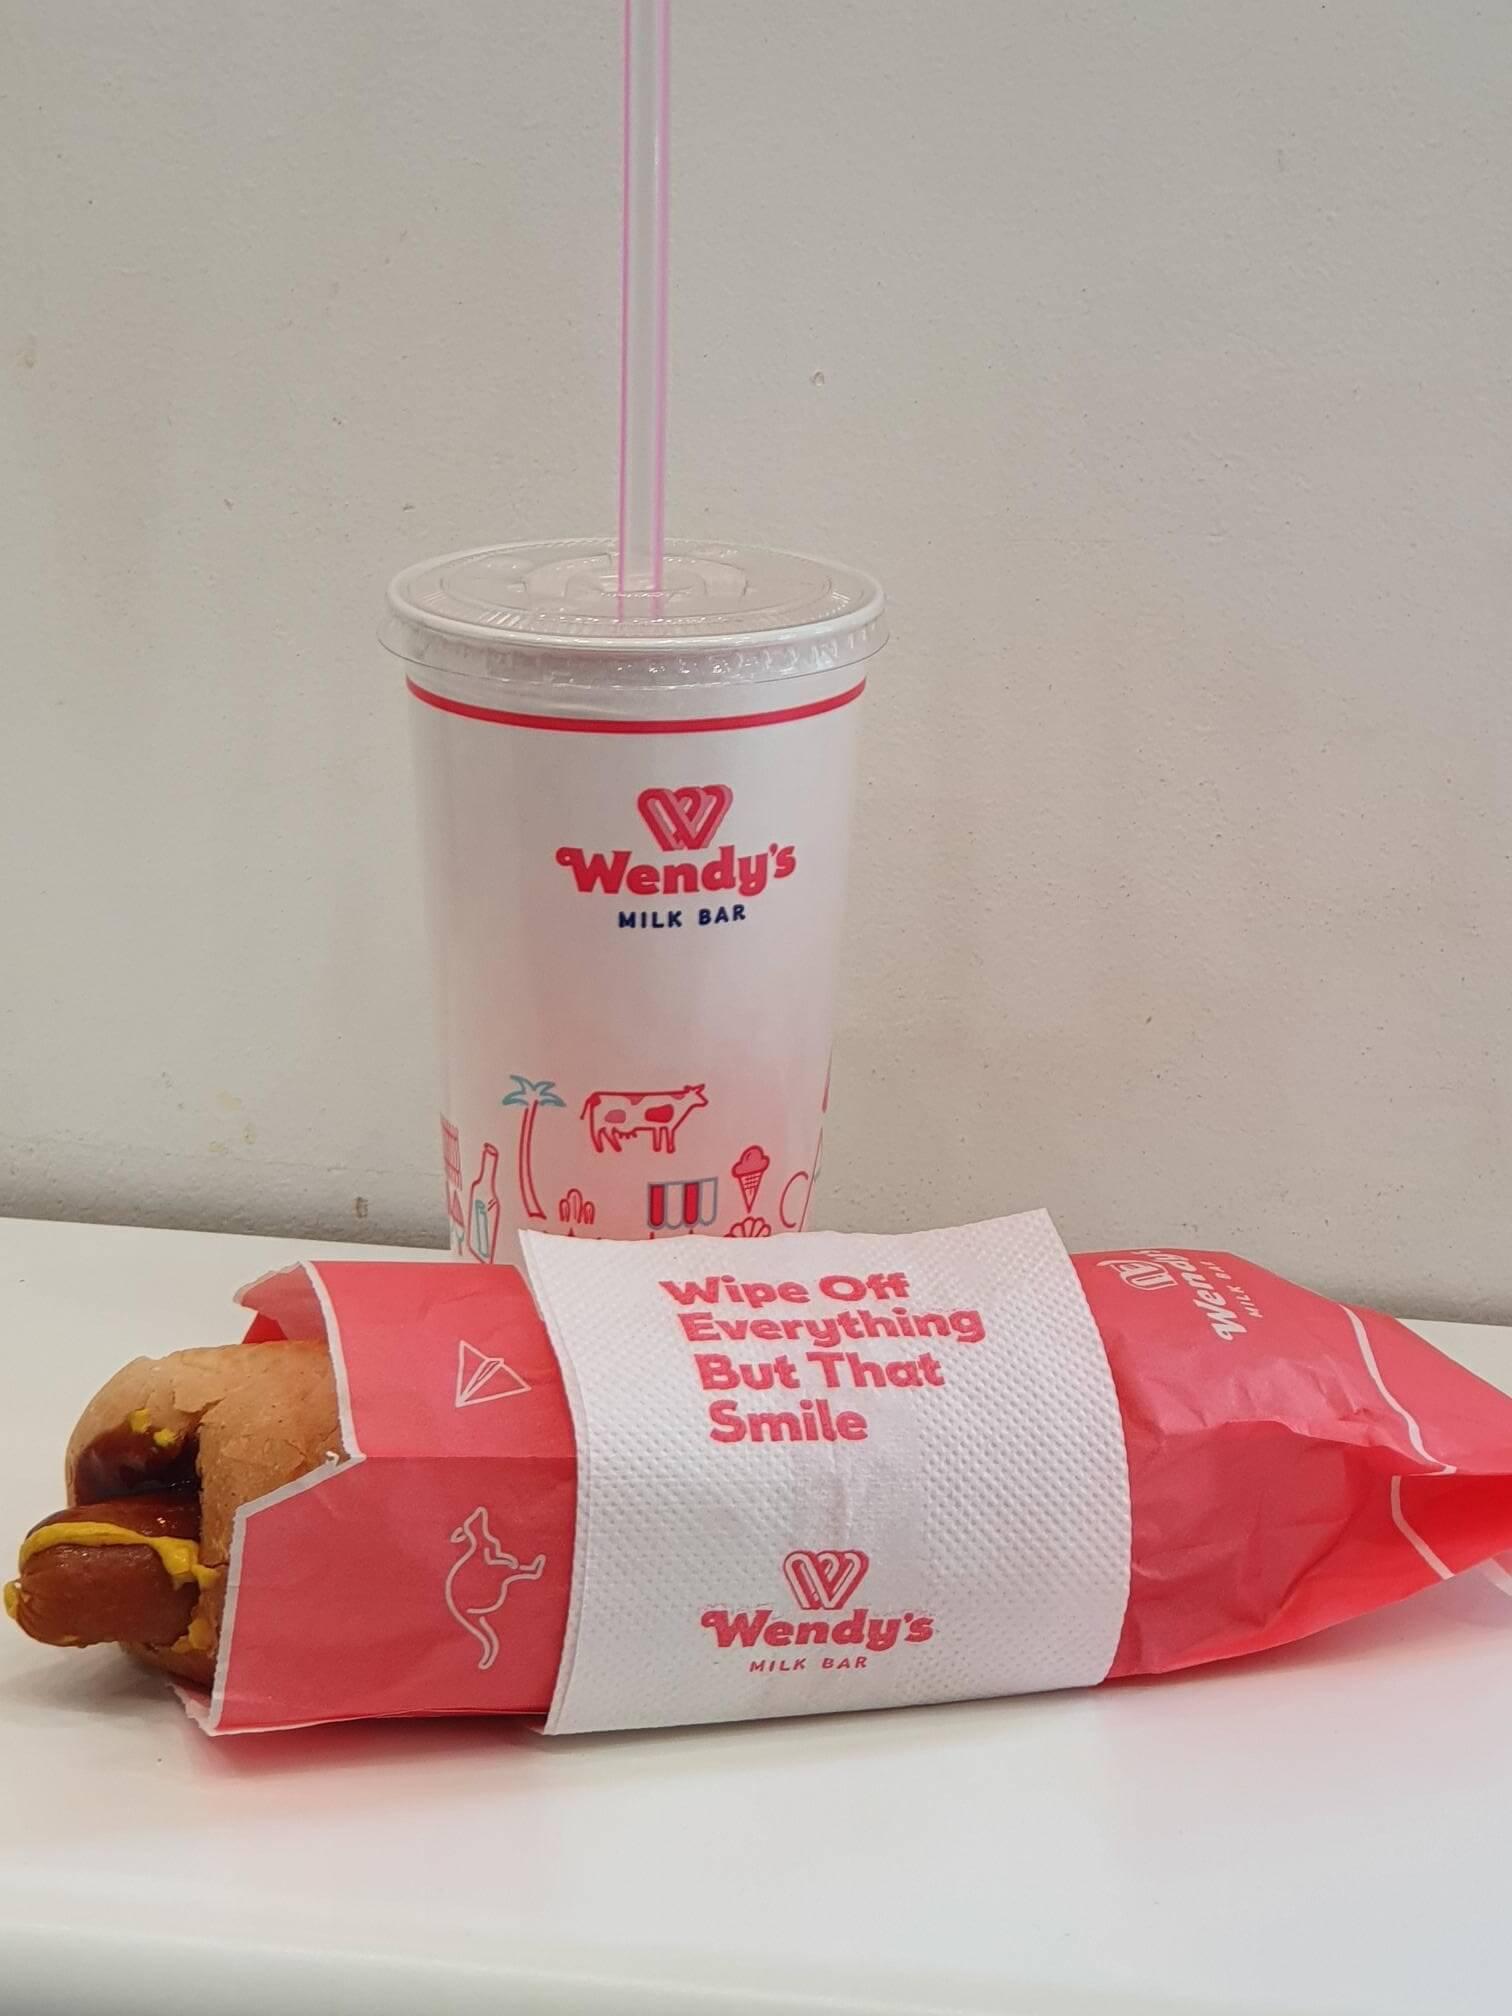 Wendy's hot dog pic ready.jpg